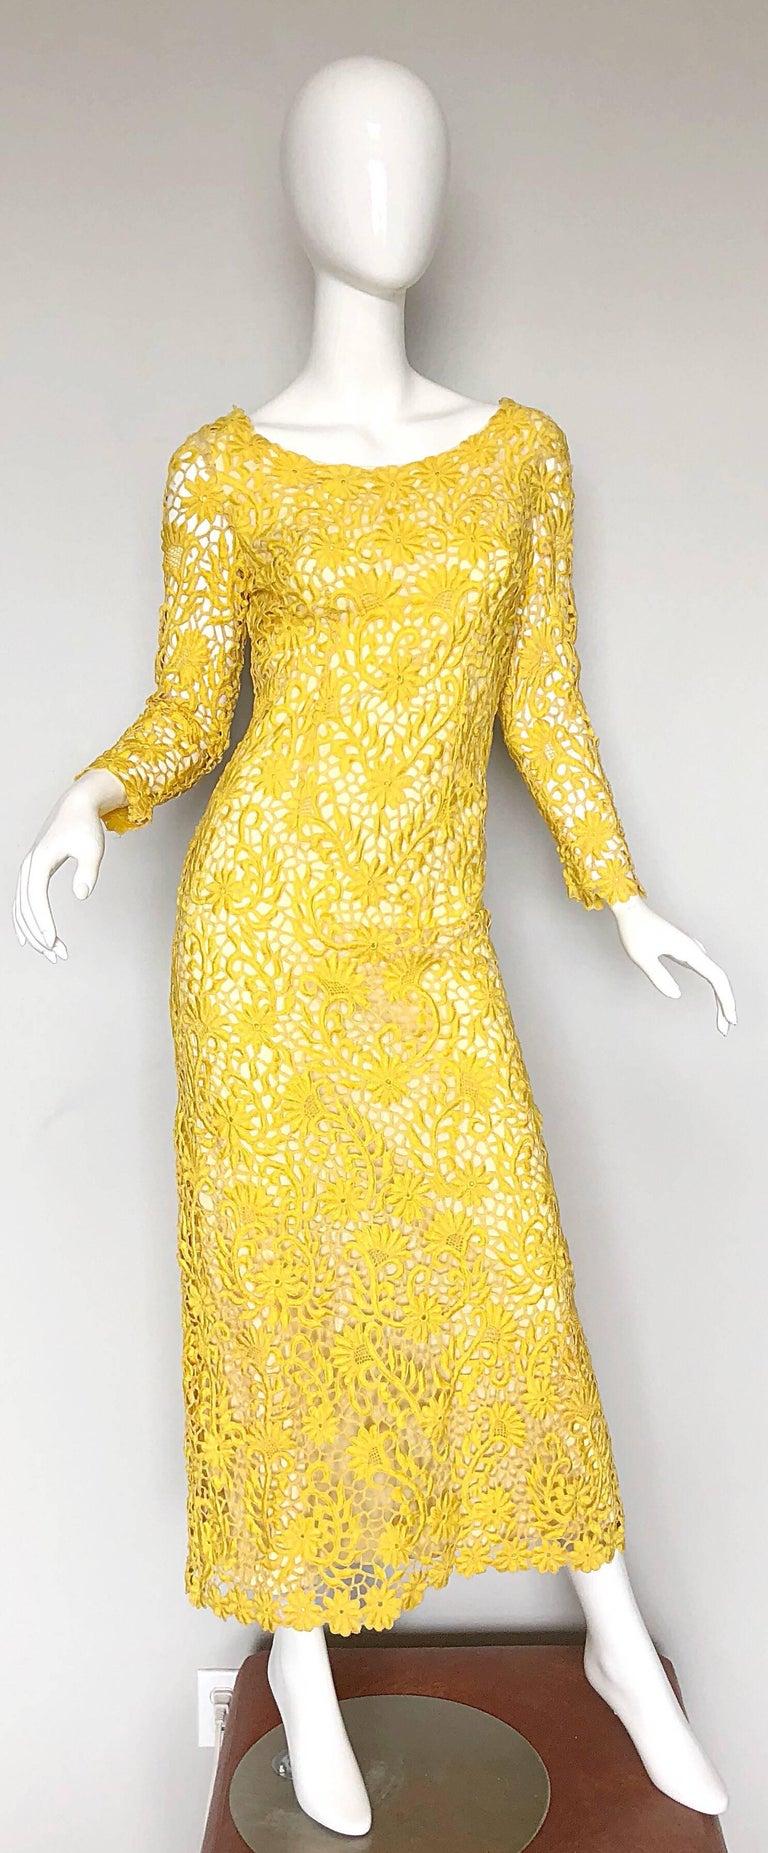 dc600923ac1 Joe Salazar Rare 1960s Canary Yellow Hand Crochet Vintage 60s Maxi ...